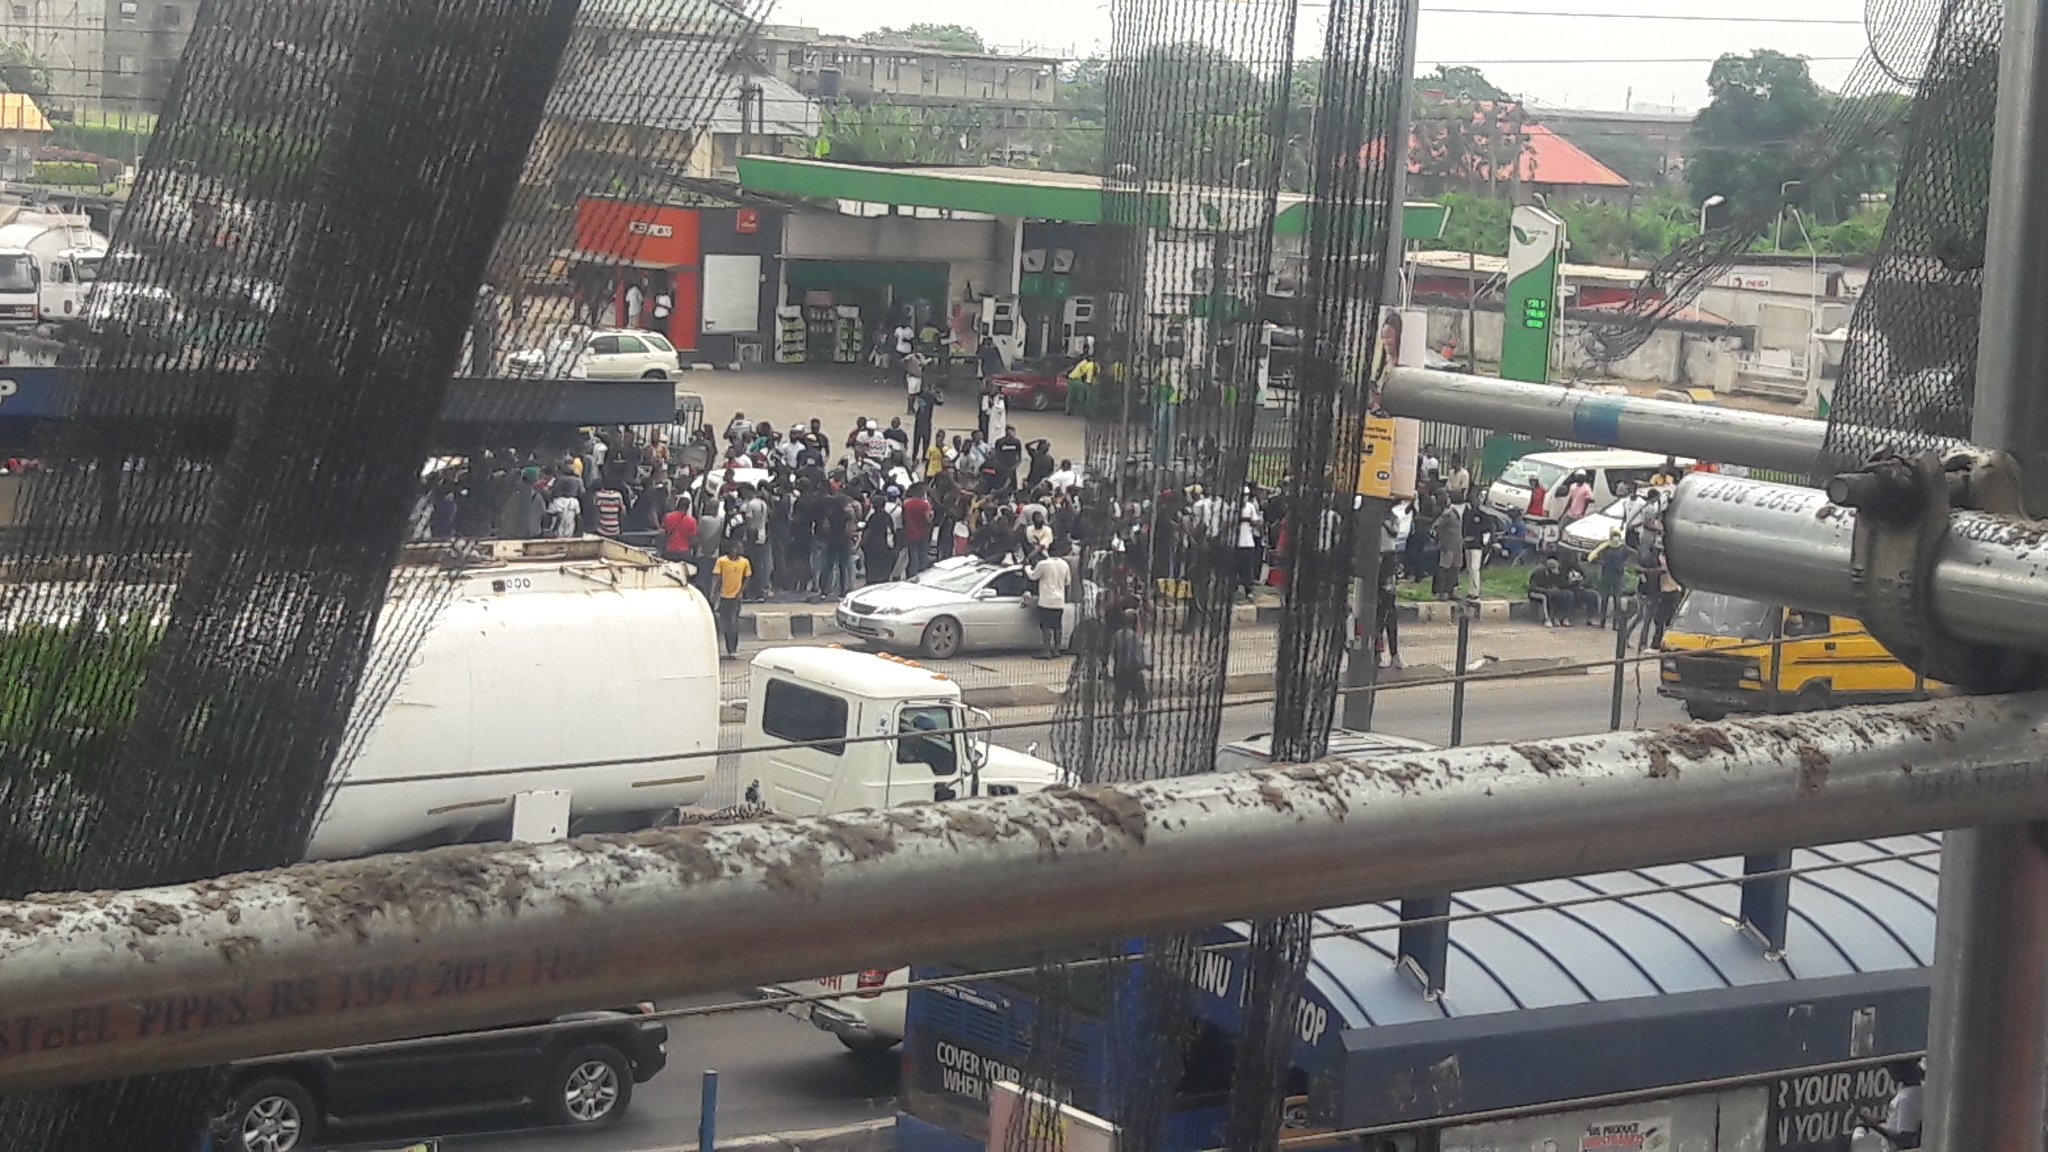 #ENDSARS protest, Lagos